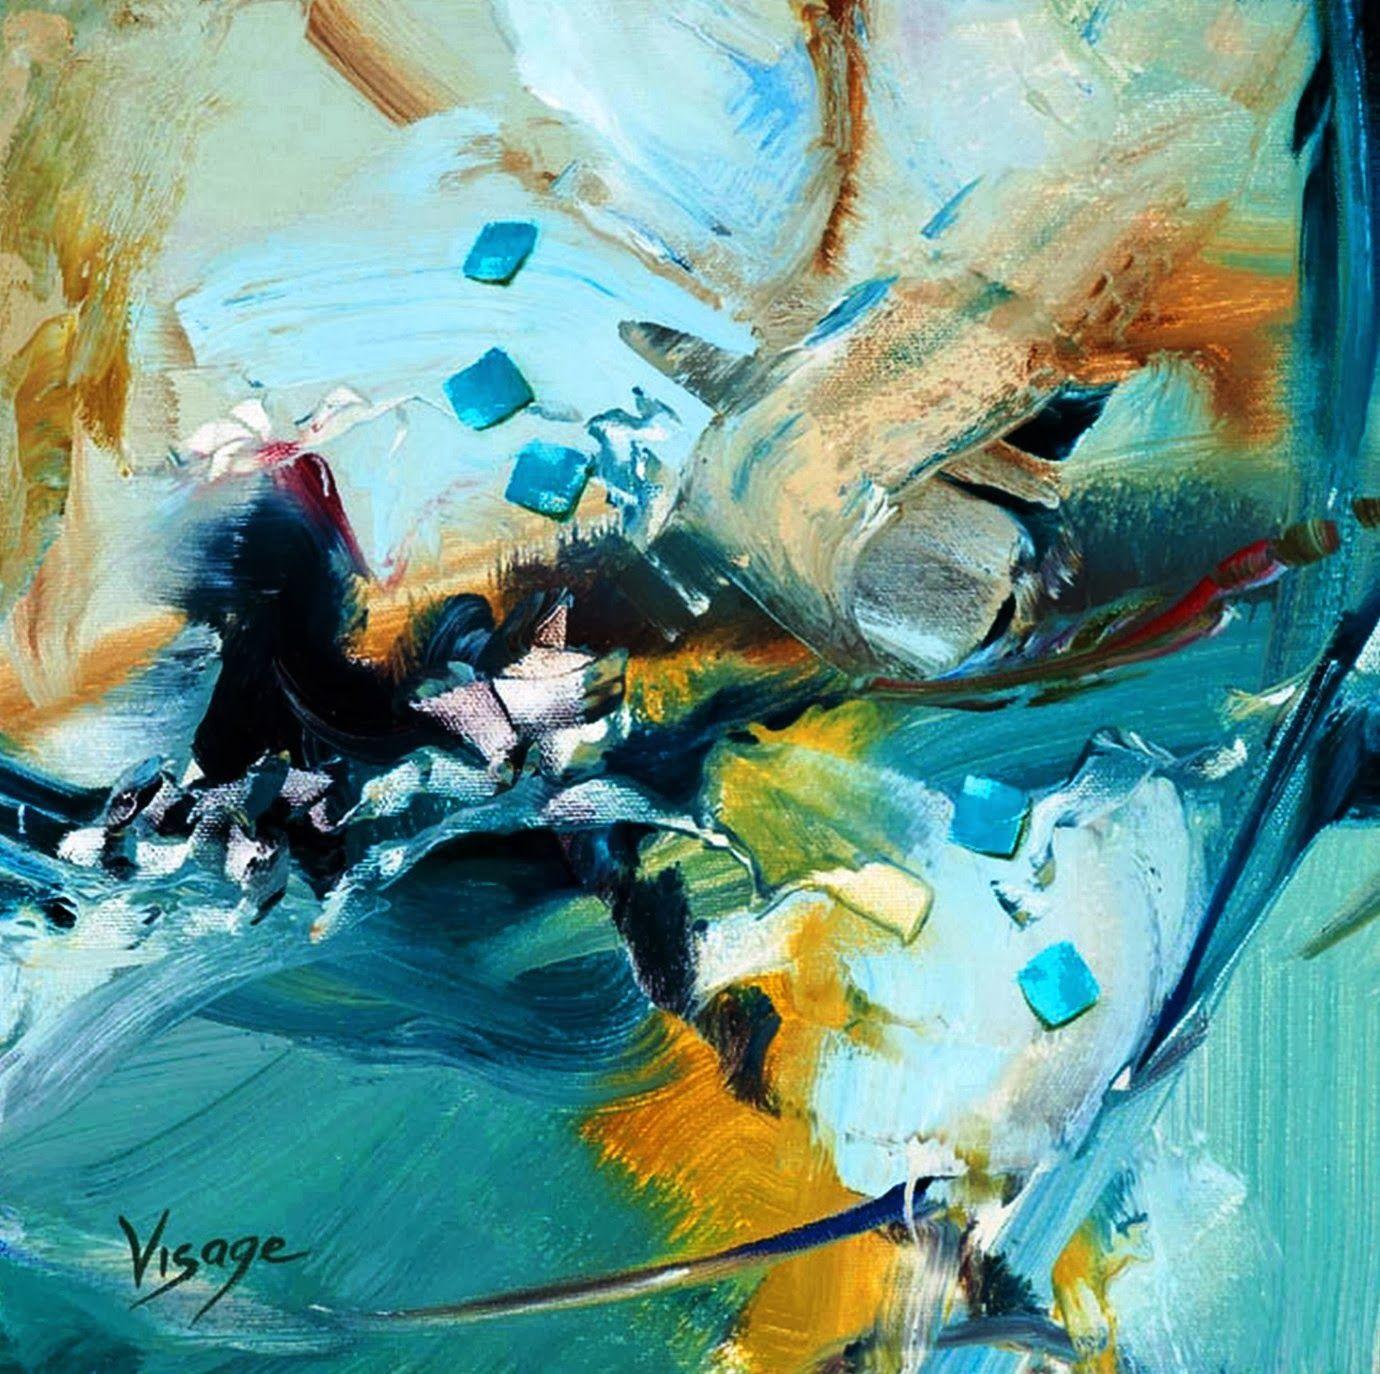 Cuadros abstractos modernos pintados al oleo pinturas - Fotos cuadros abstractos ...